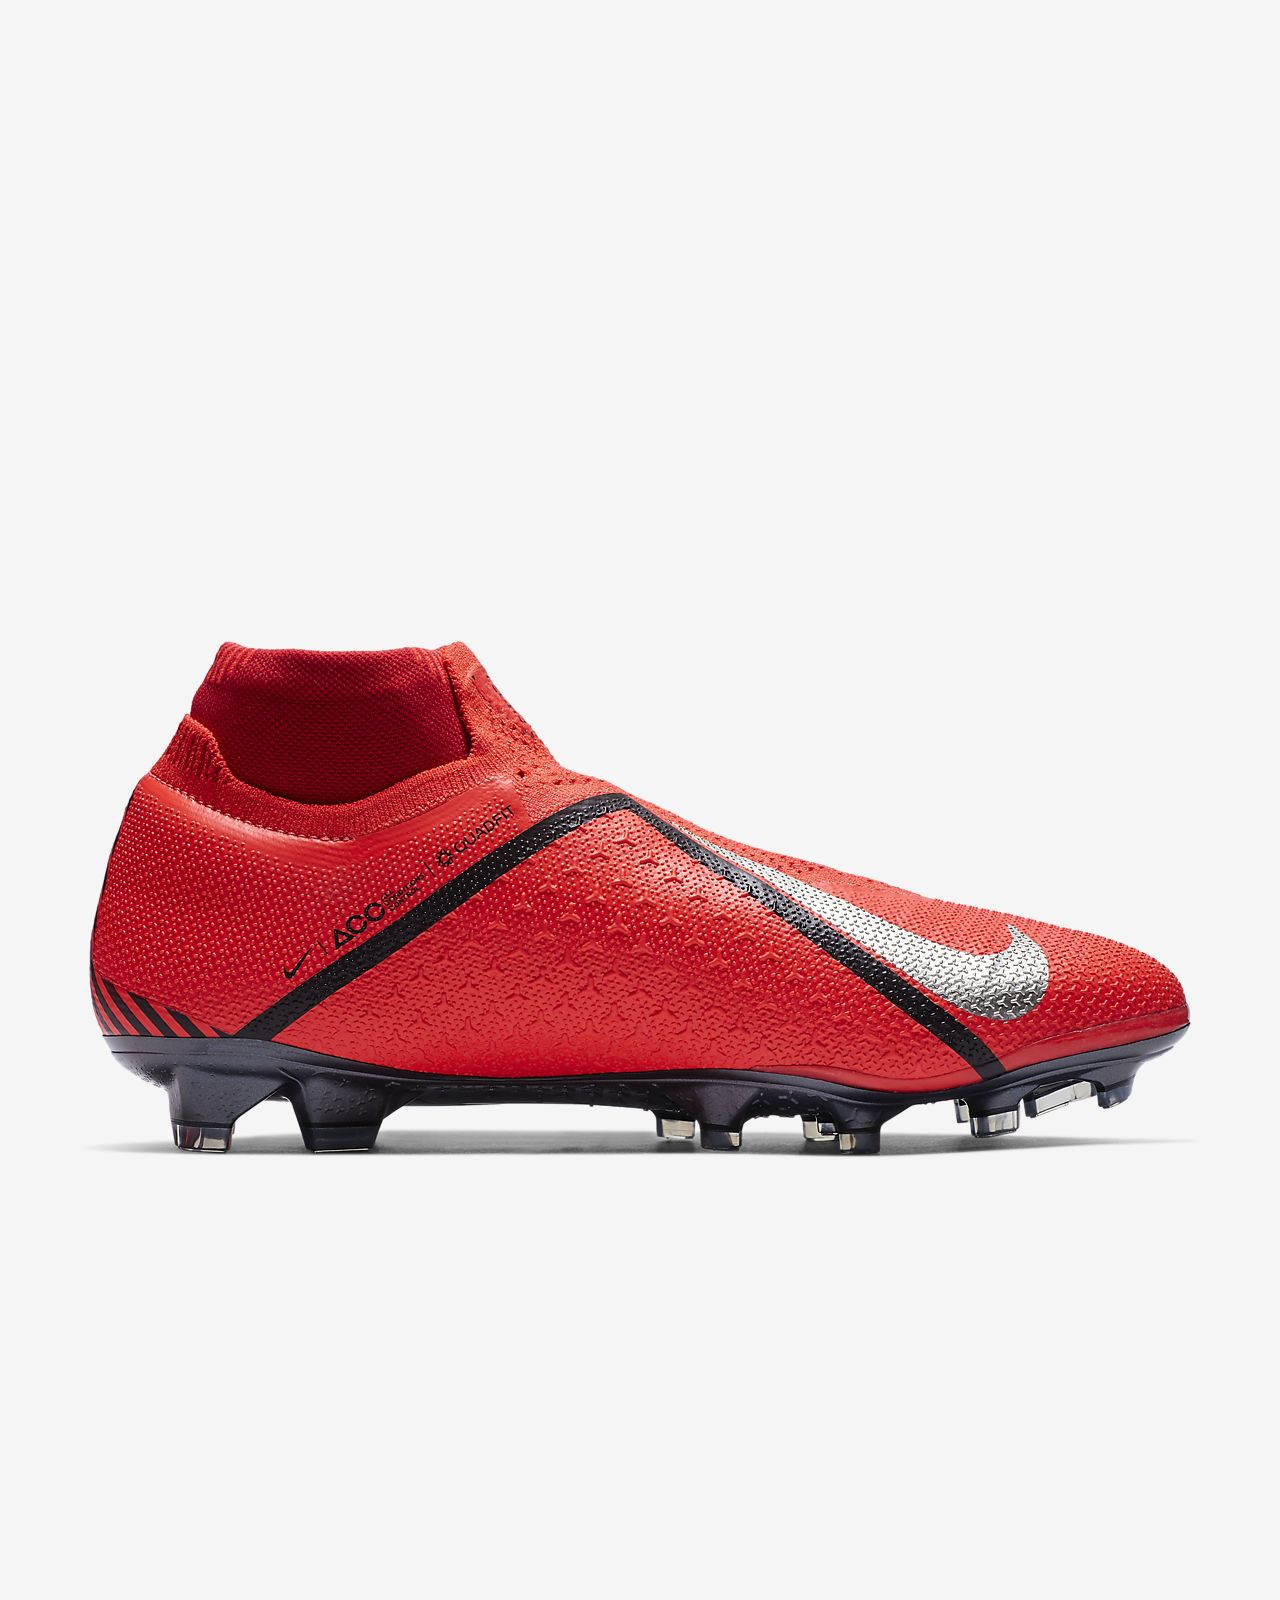 92da28f1f7ce ... Nike PhantomVSN Elite Dynamic Fit Game Over FG Firm-Ground Football Boot